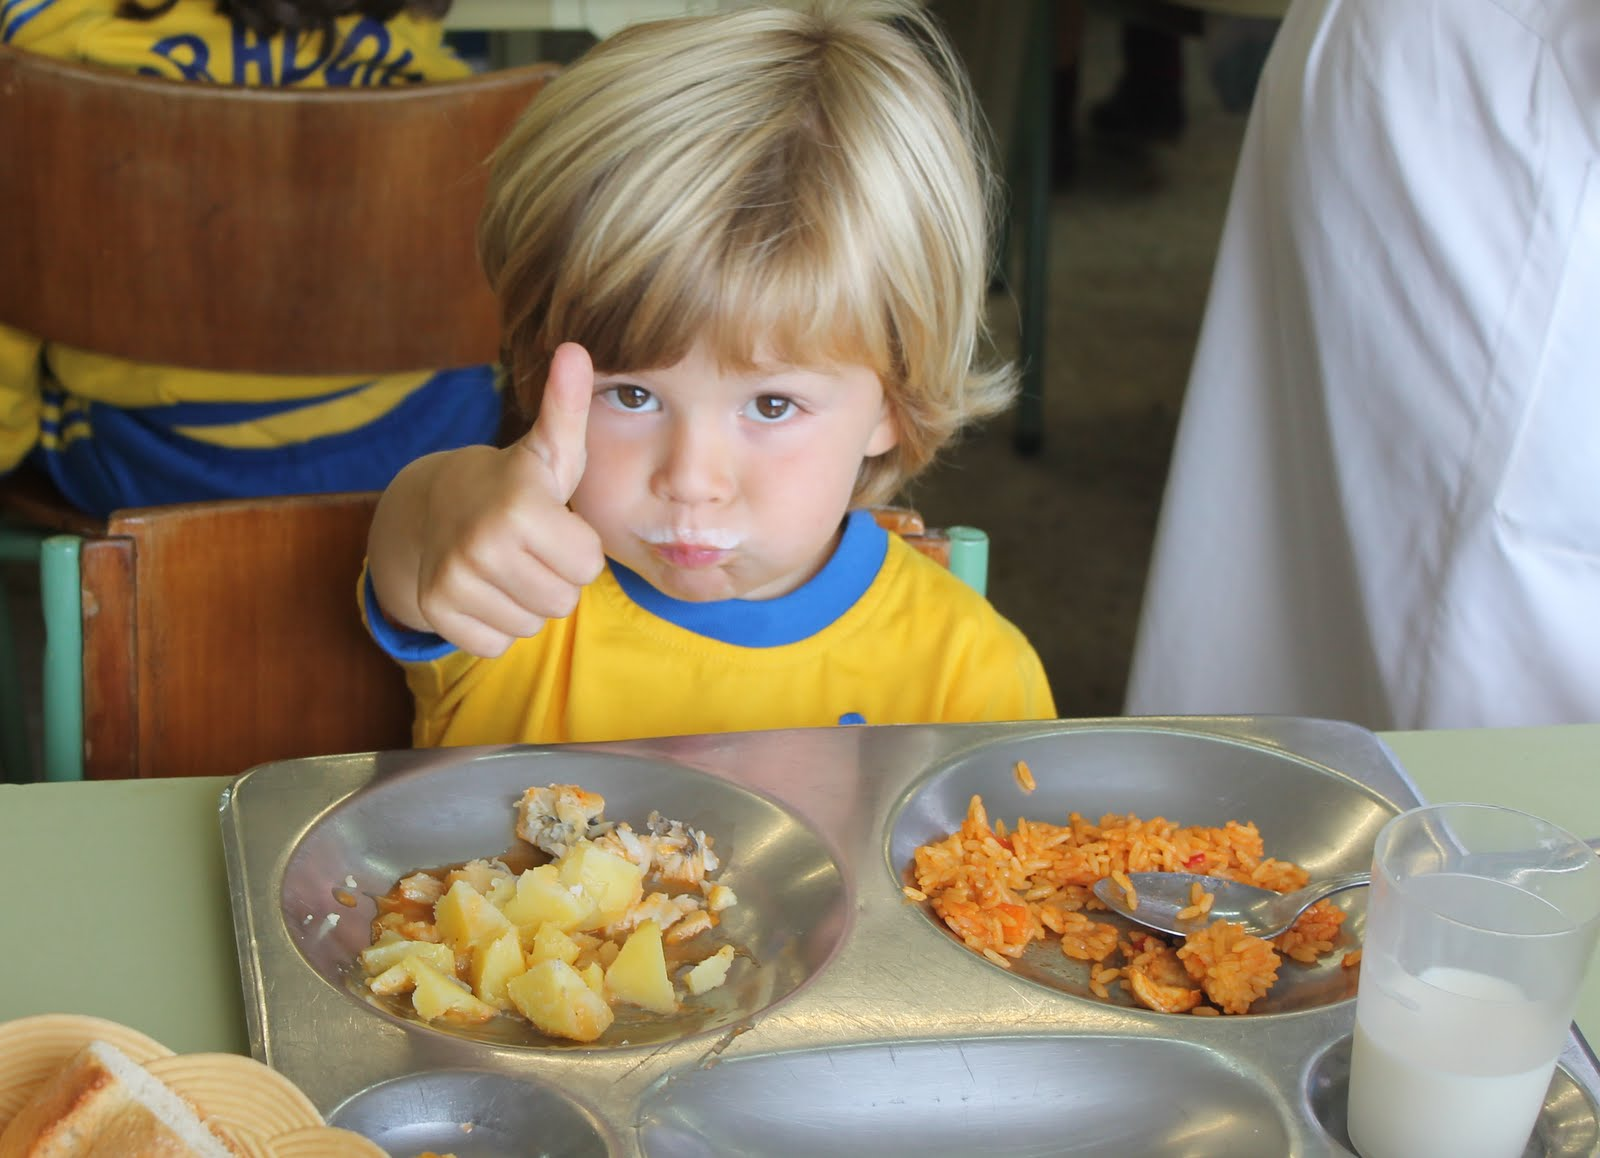 Colegio Obradoiro: Comedor escolar de calidad